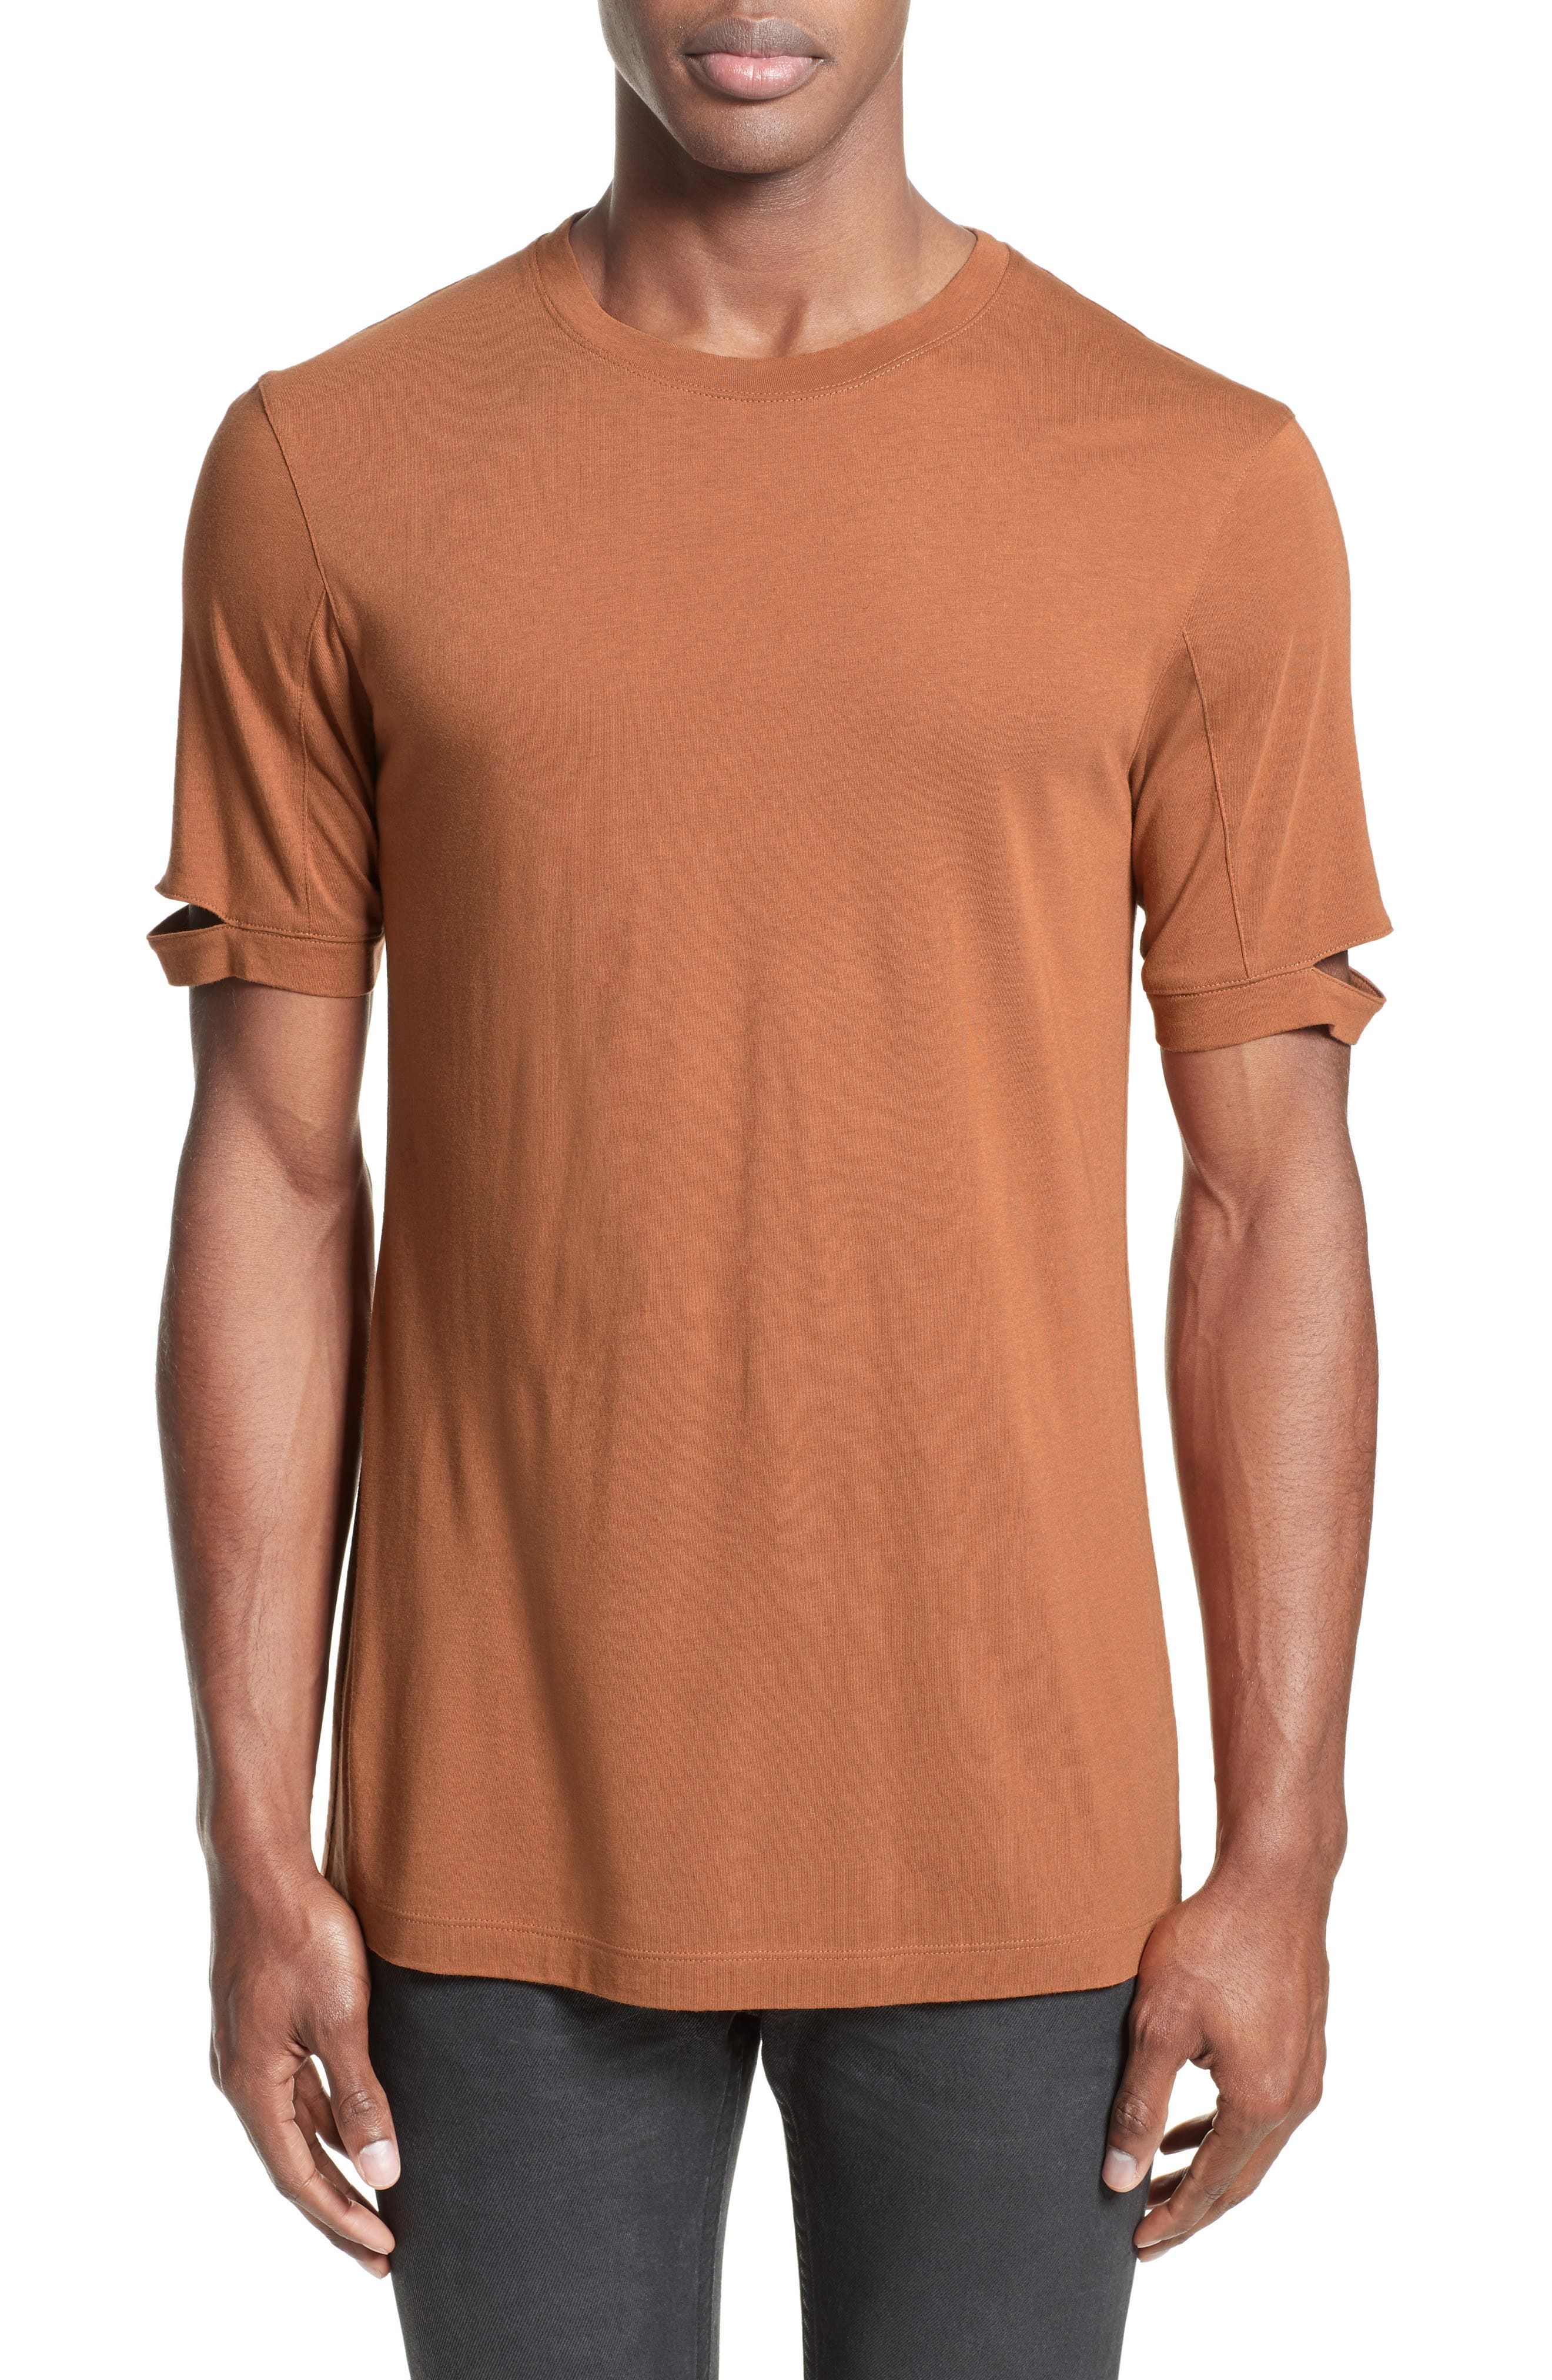 Alternate Image 1 Selected - Helmut Lang Sliced Sleeve T-Shirt